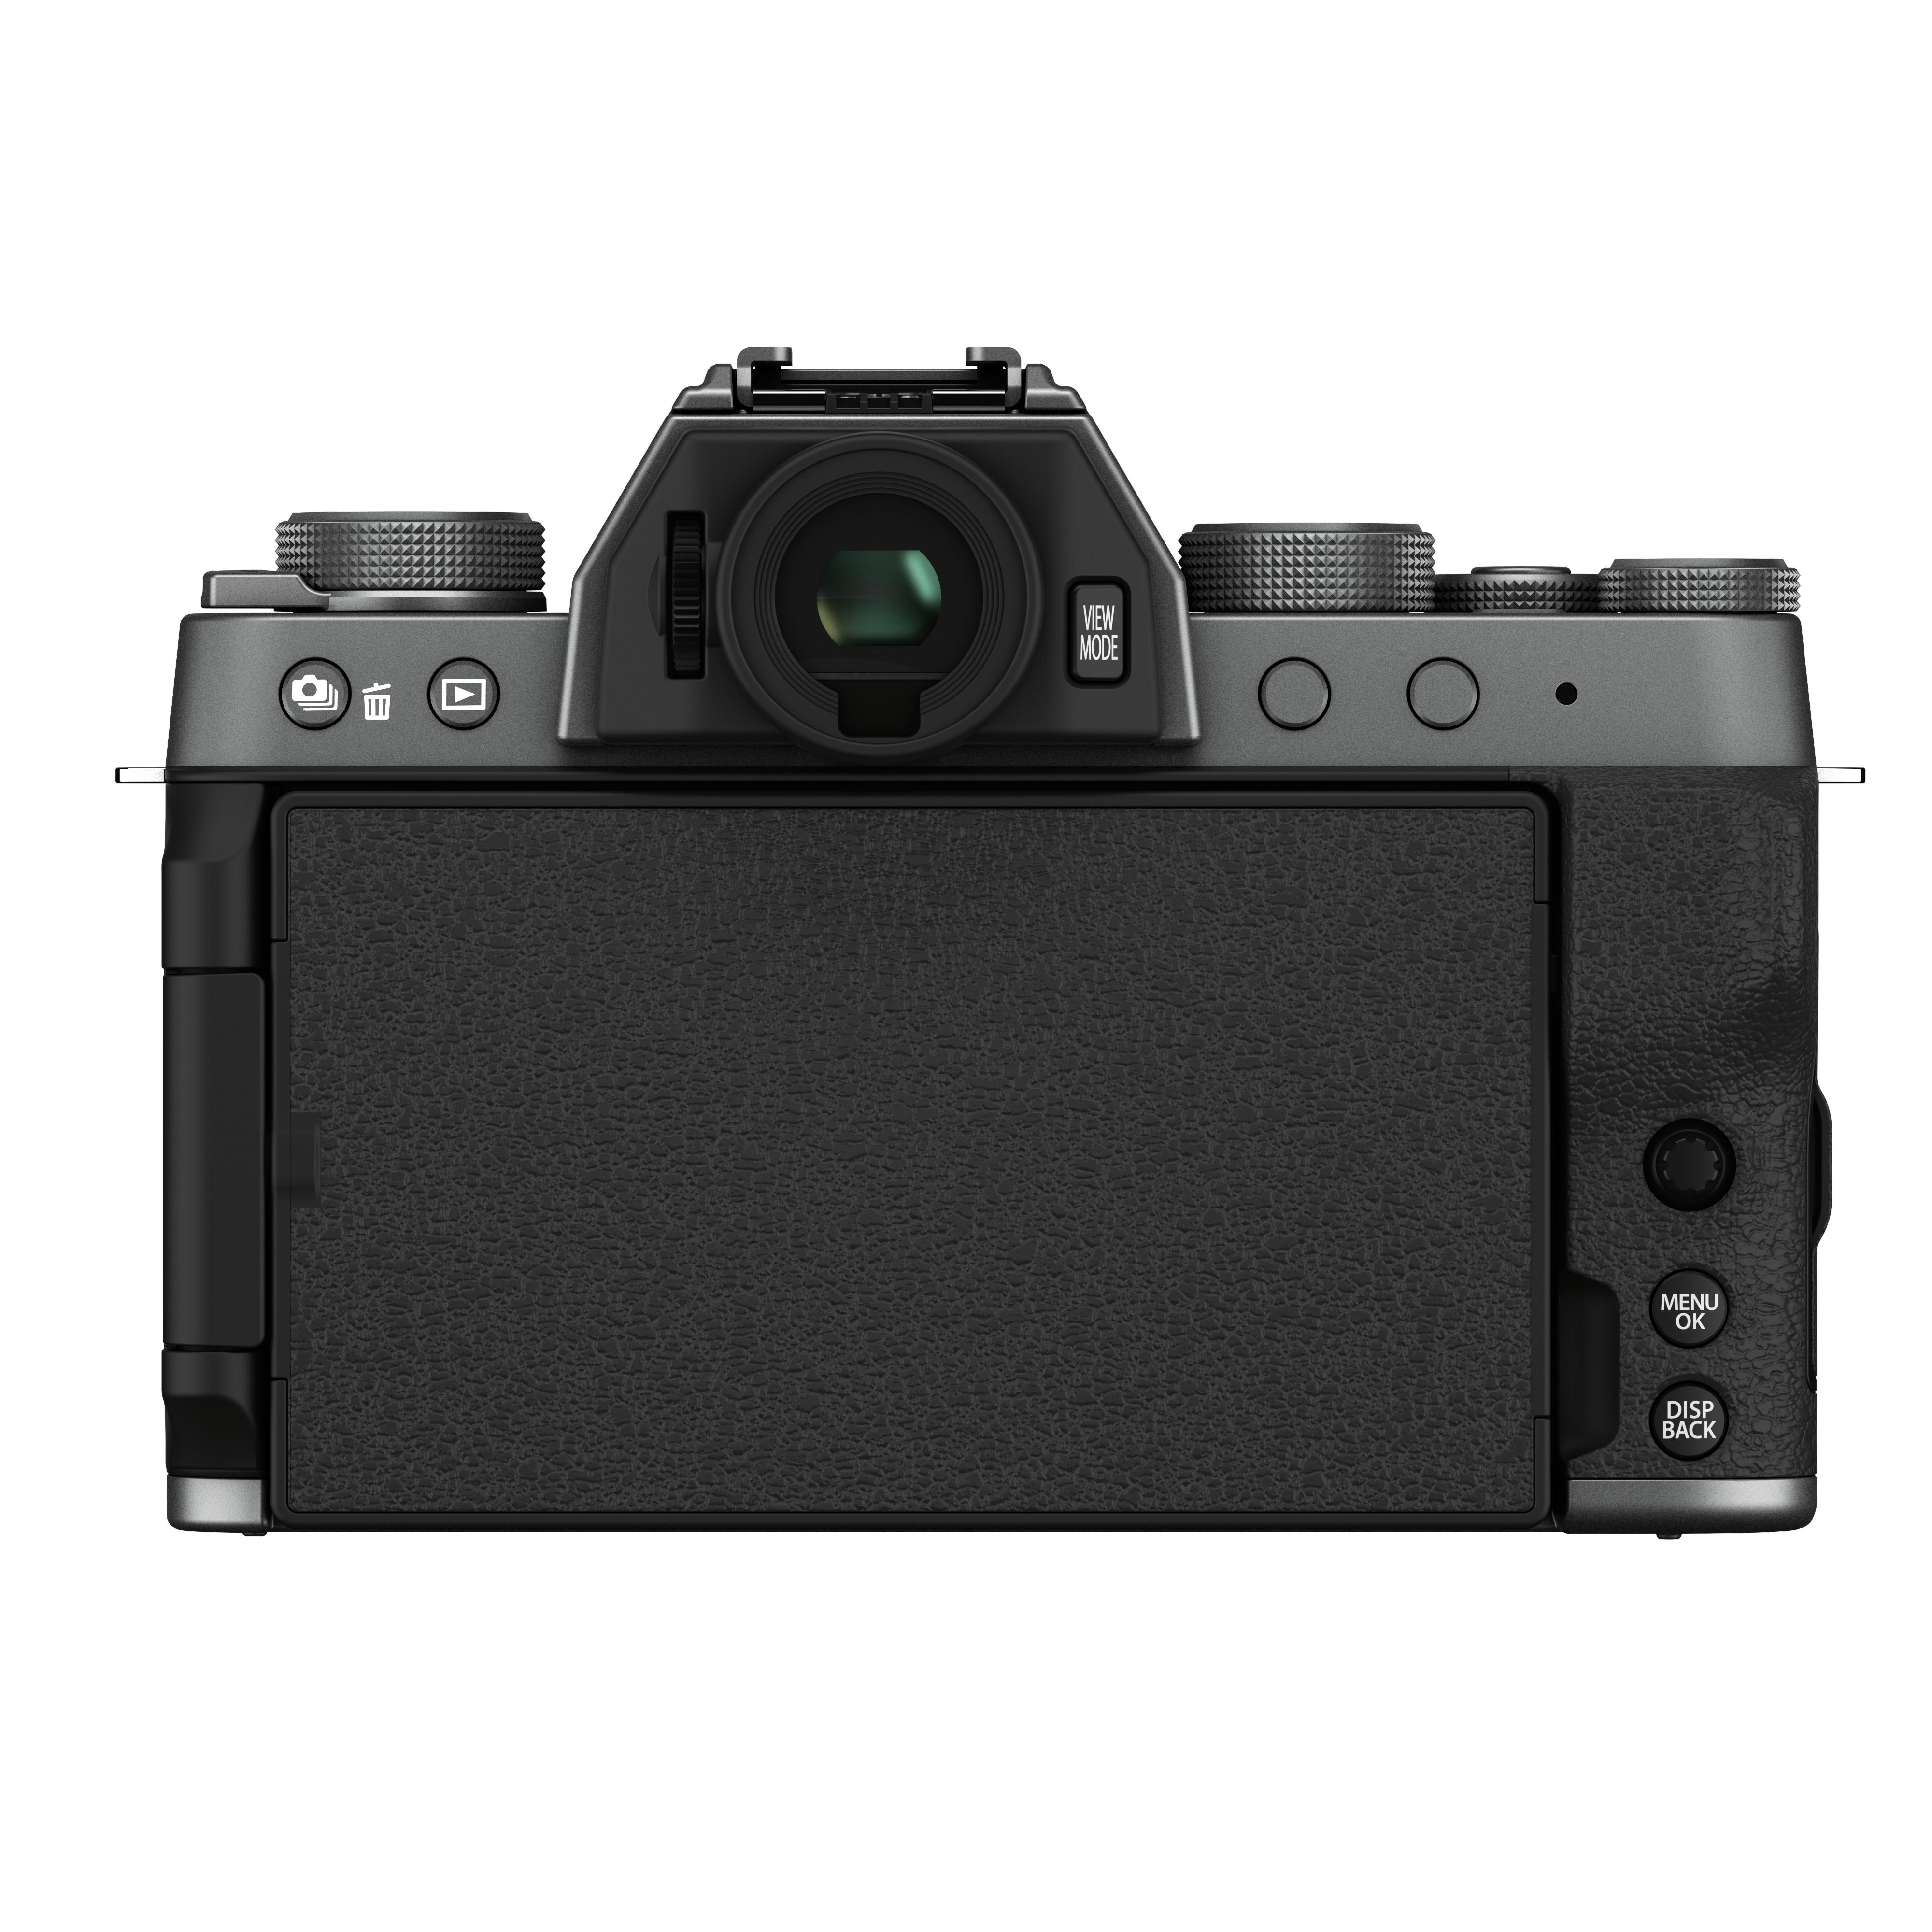 Fujifilm X-T200 Dark Silver + XC 15-45mm f/3.5-5.6